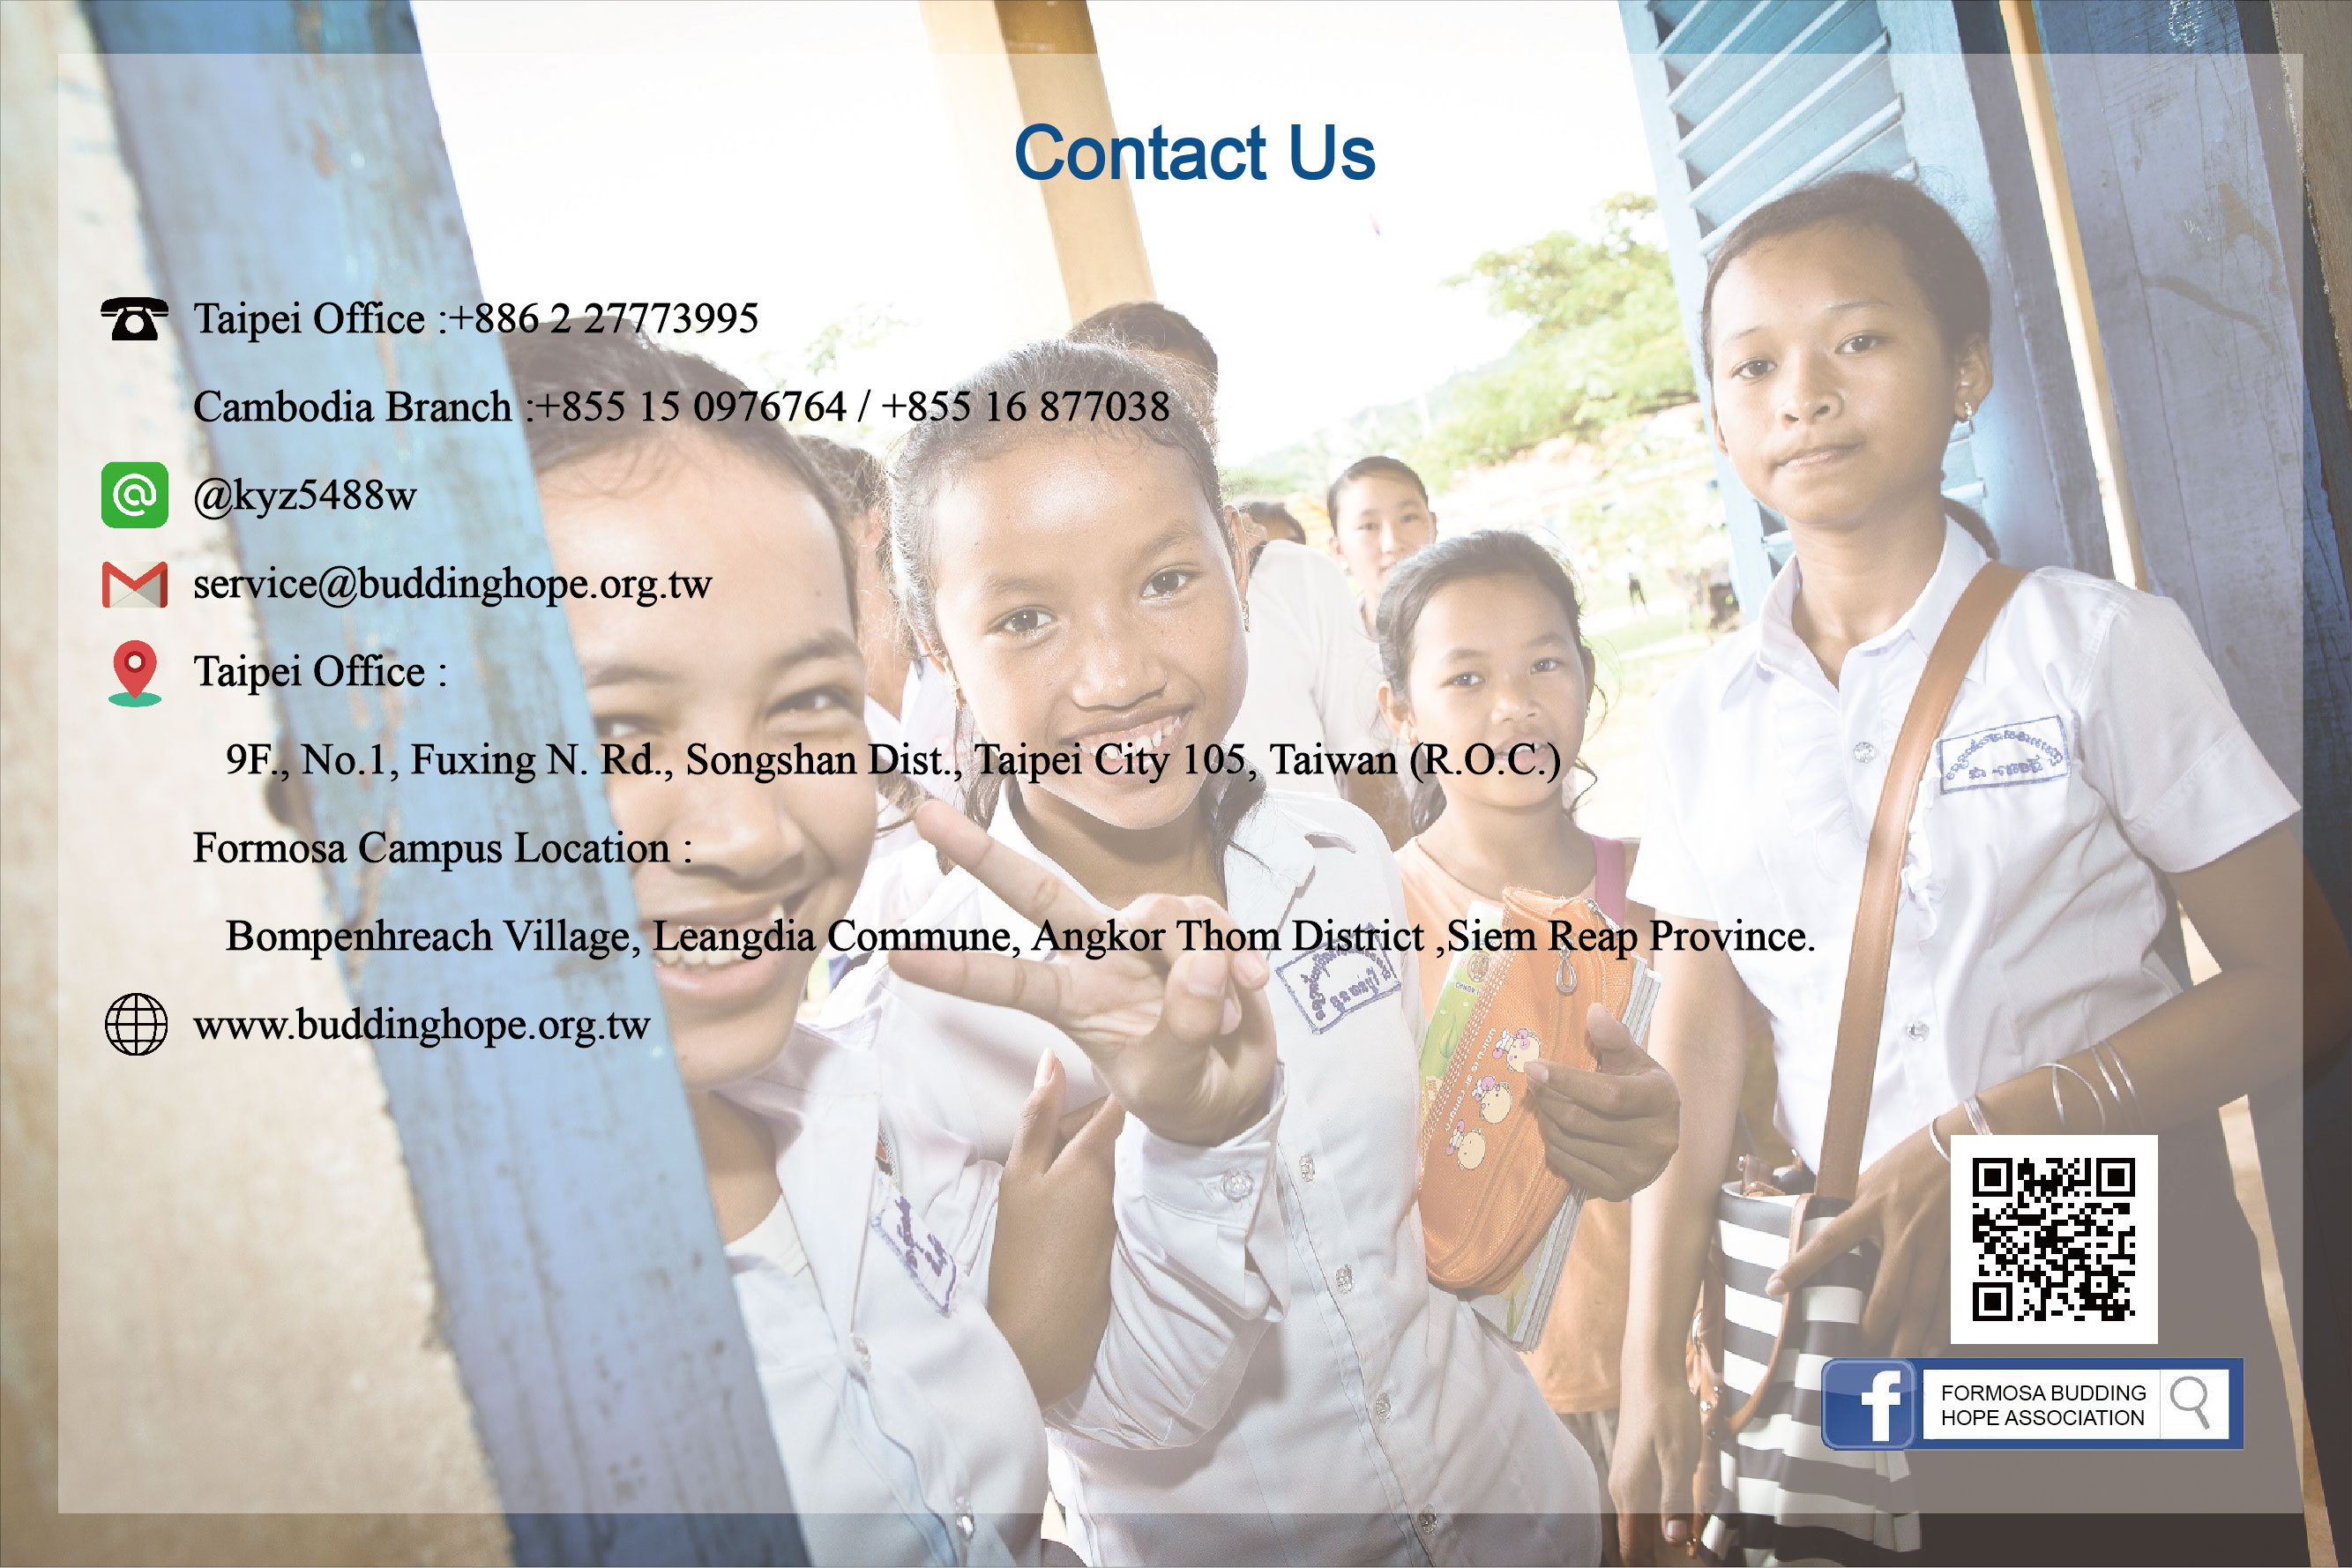 {637387217554515421}_Contact_Us-edit-01.jpg